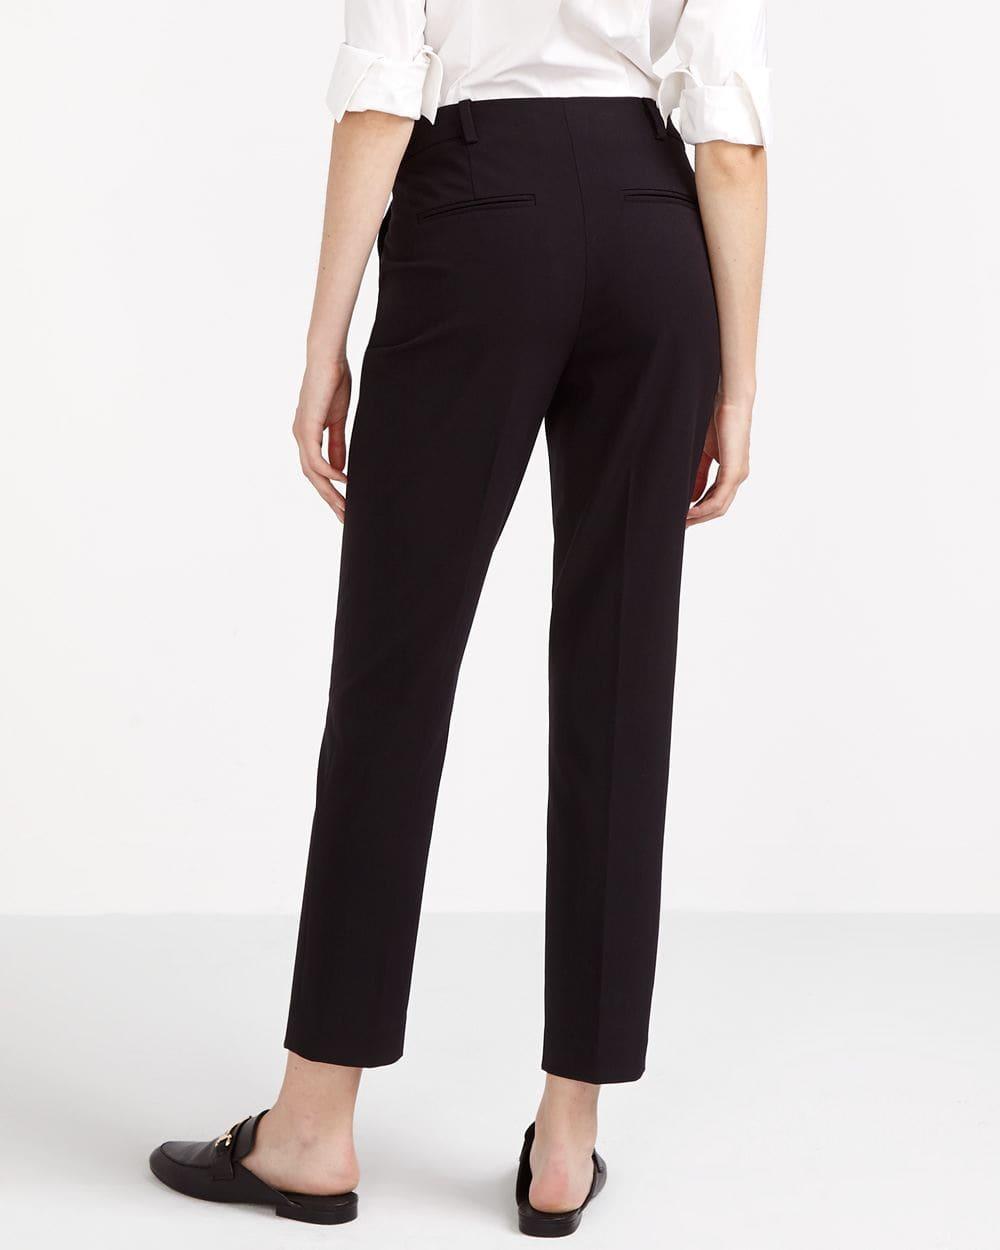 Willow & Thread Slim Pants